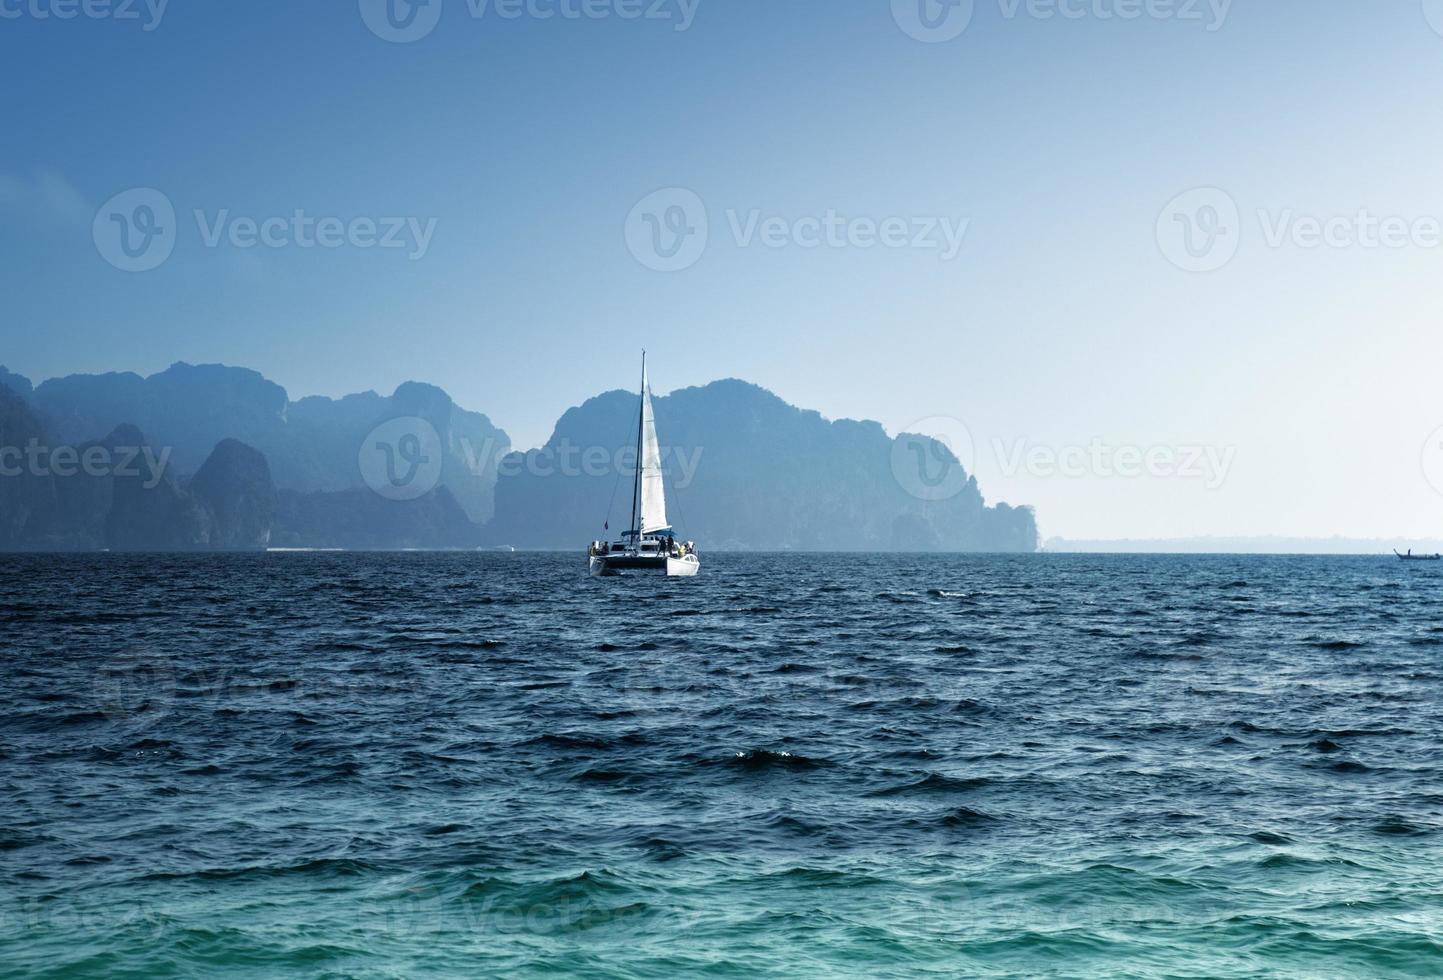 yacht et océan province de krabi, thaïlande photo